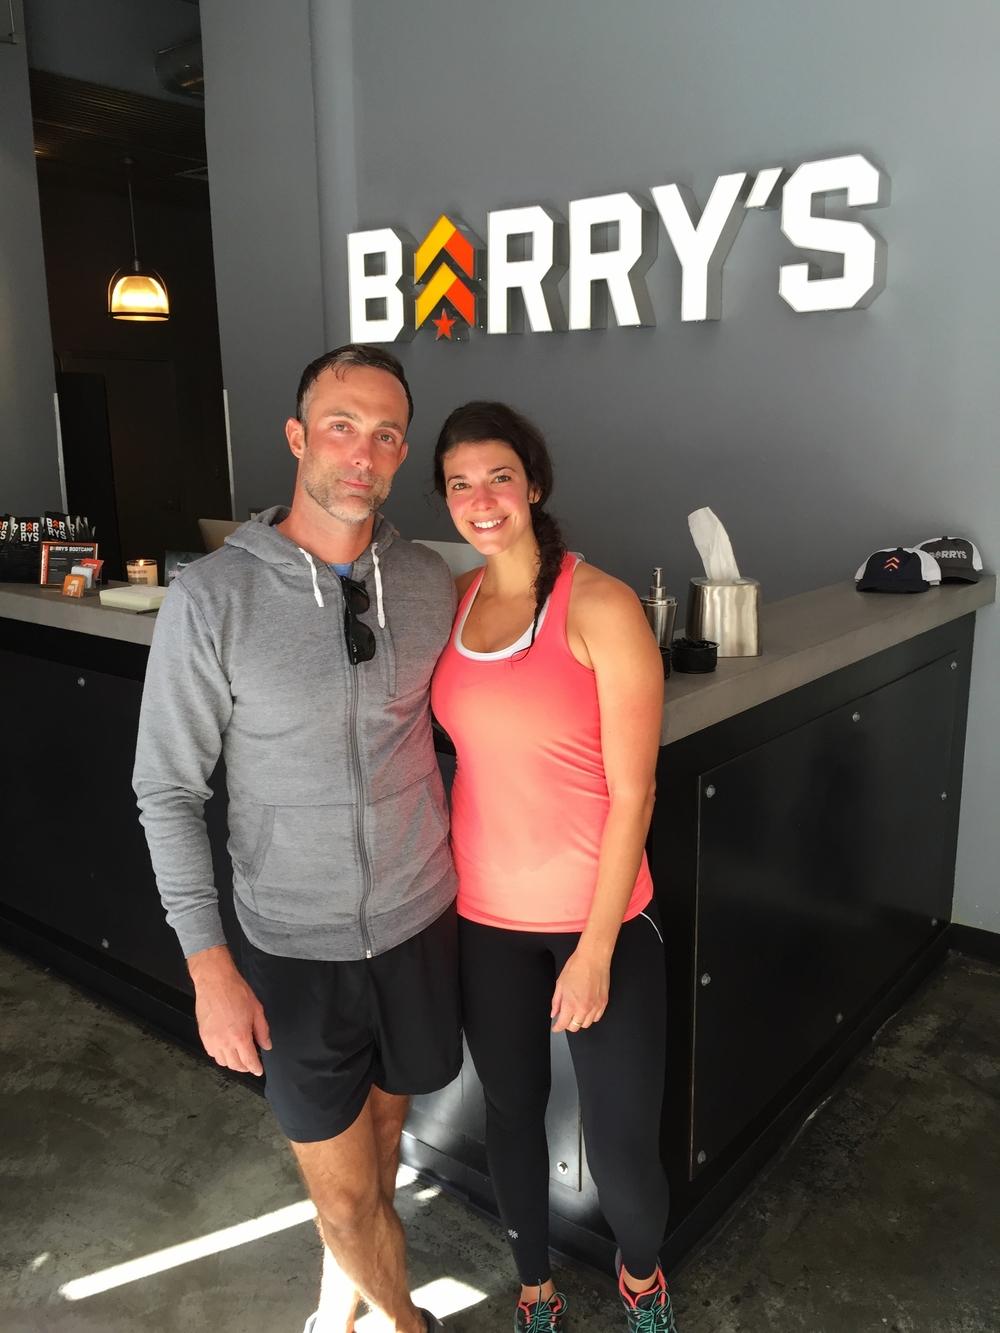 LaurenSchwaiger-Life-Style-Blog-Barrys-Bootcamp-NYC.jpg